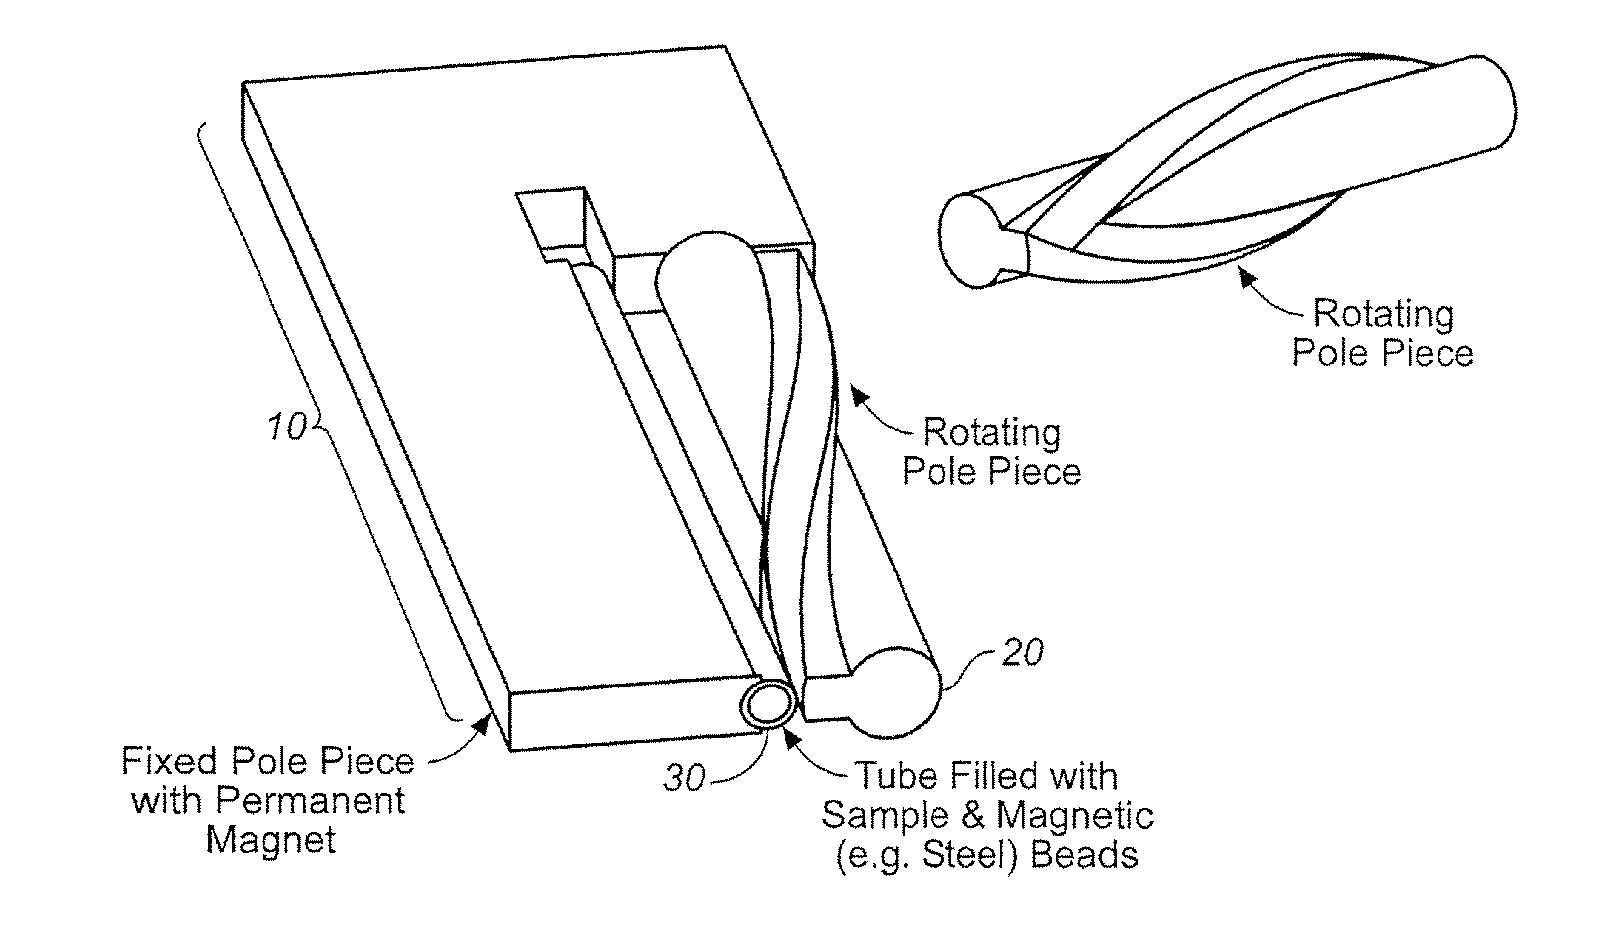 Patent US 9,752,185 B2